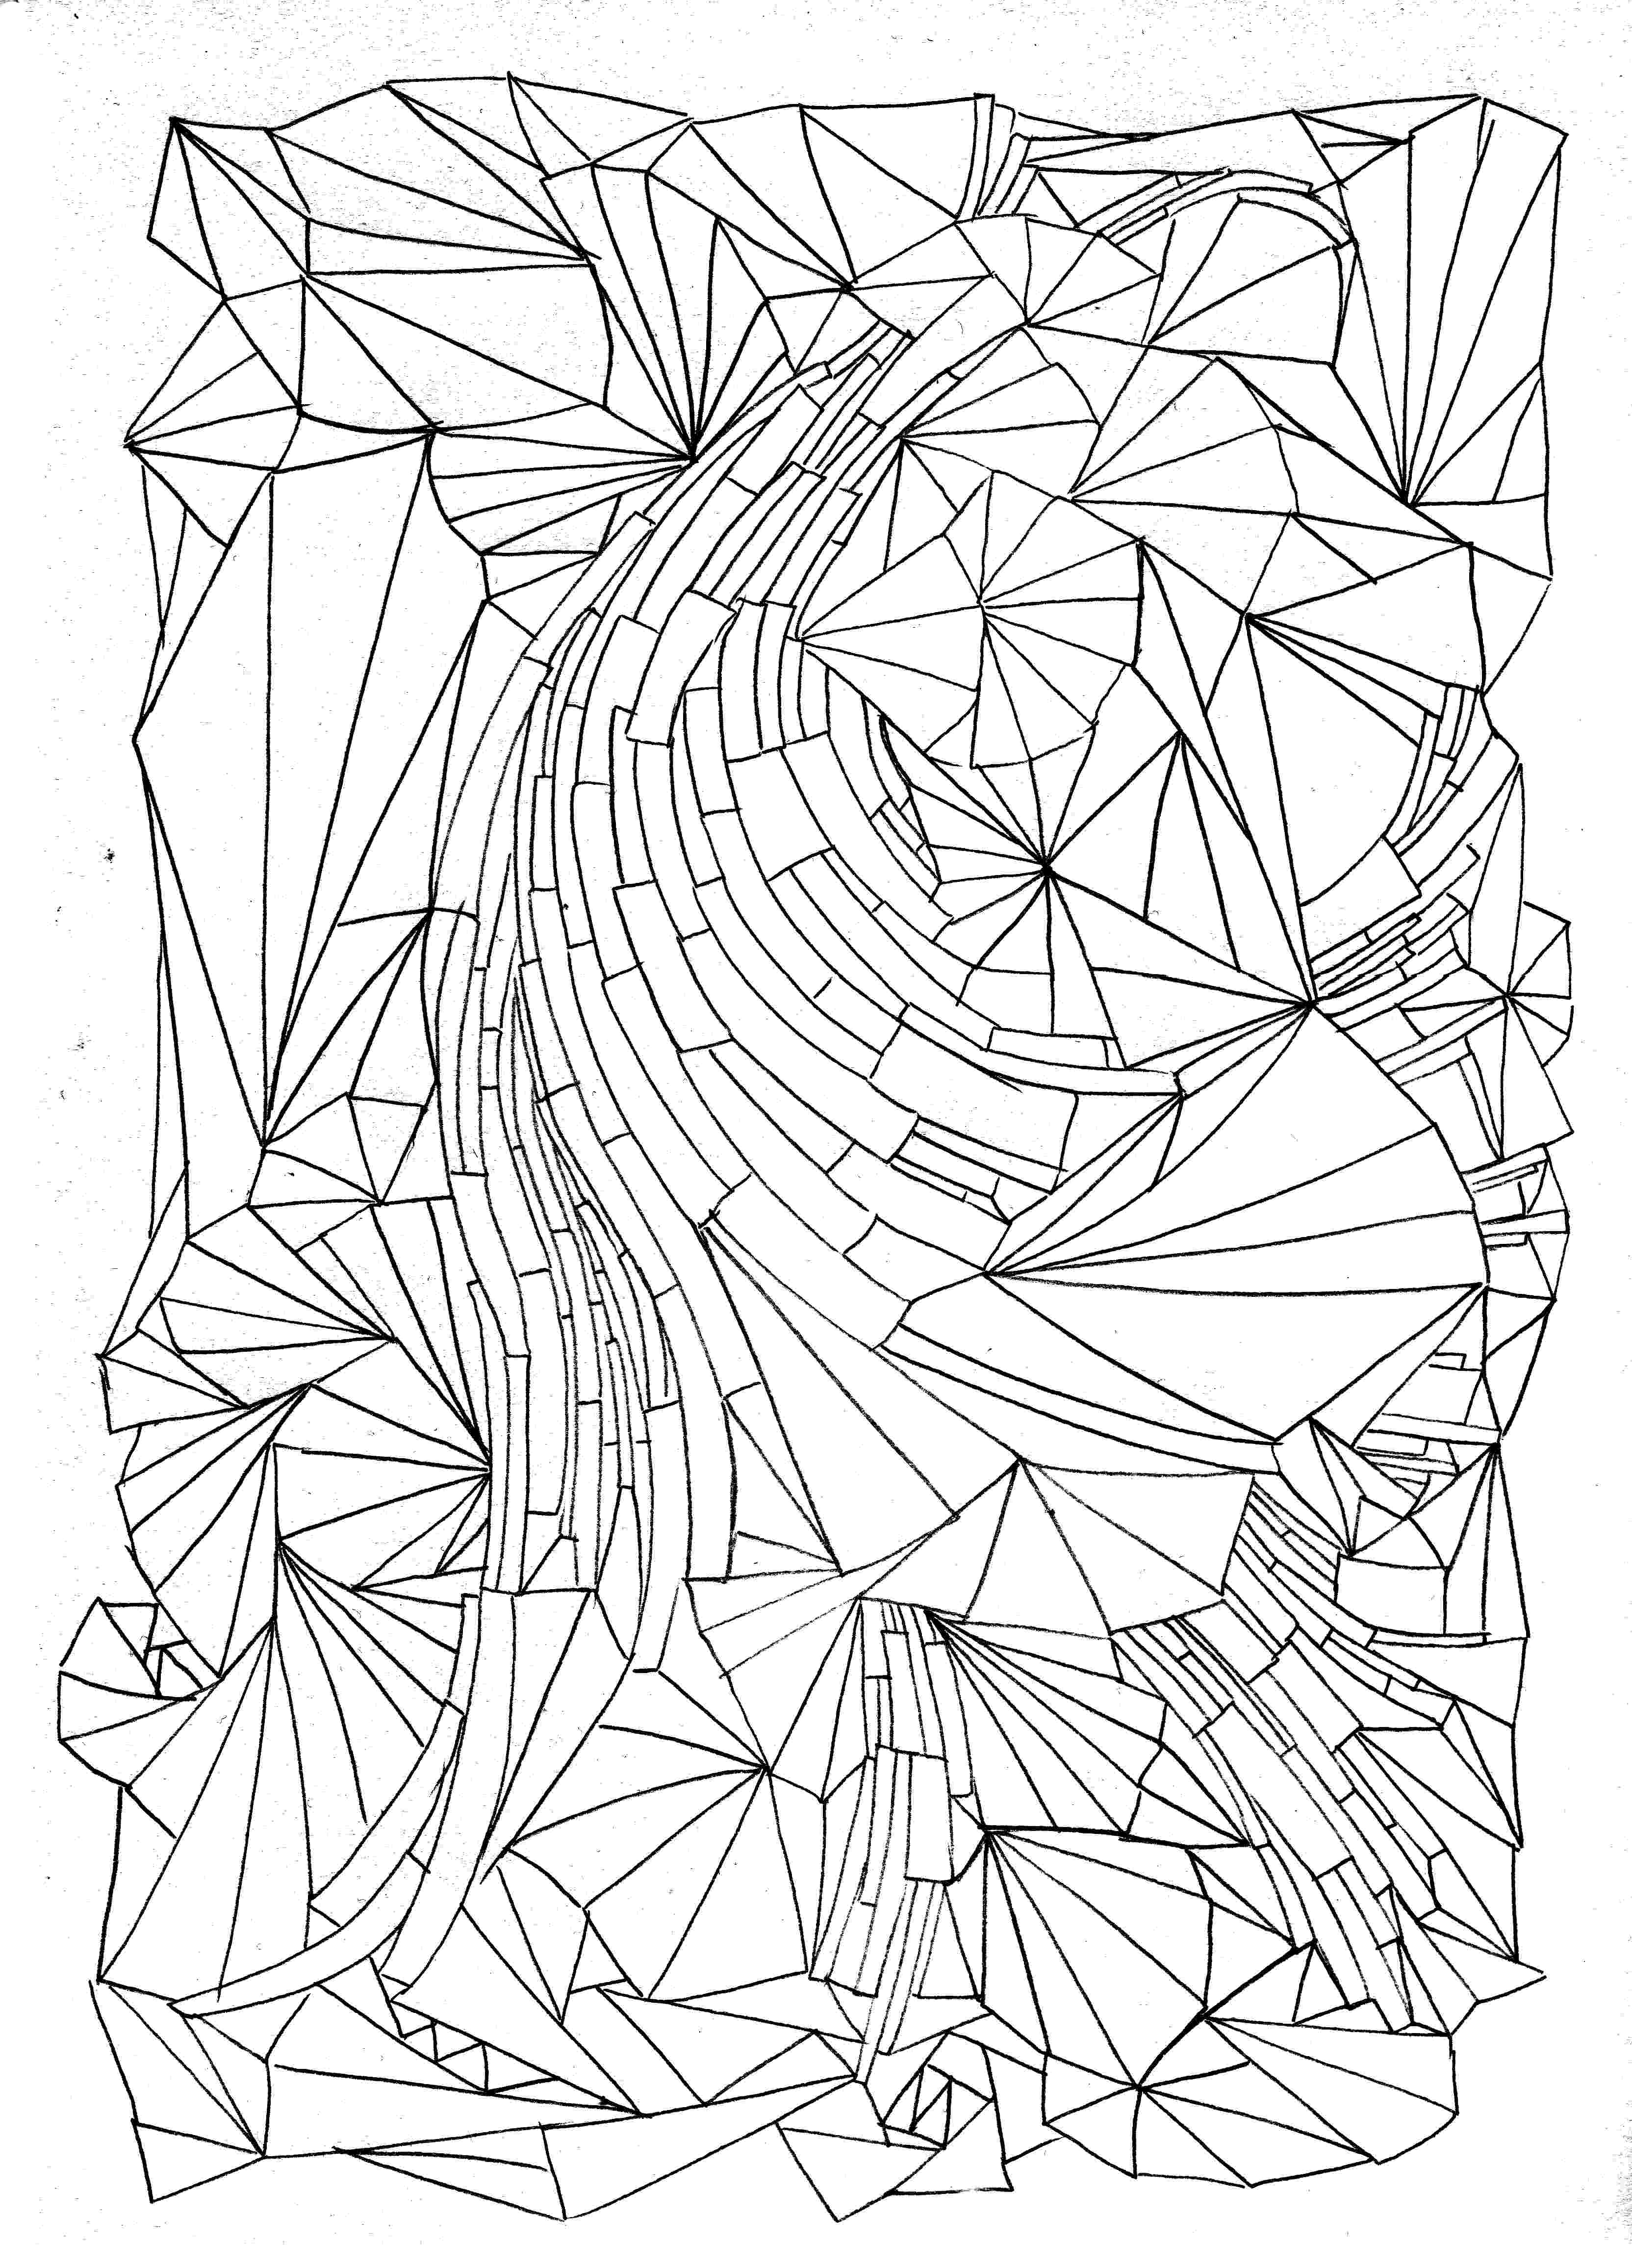 colouring patterns free printable geometric coloring pages for kids colouring patterns